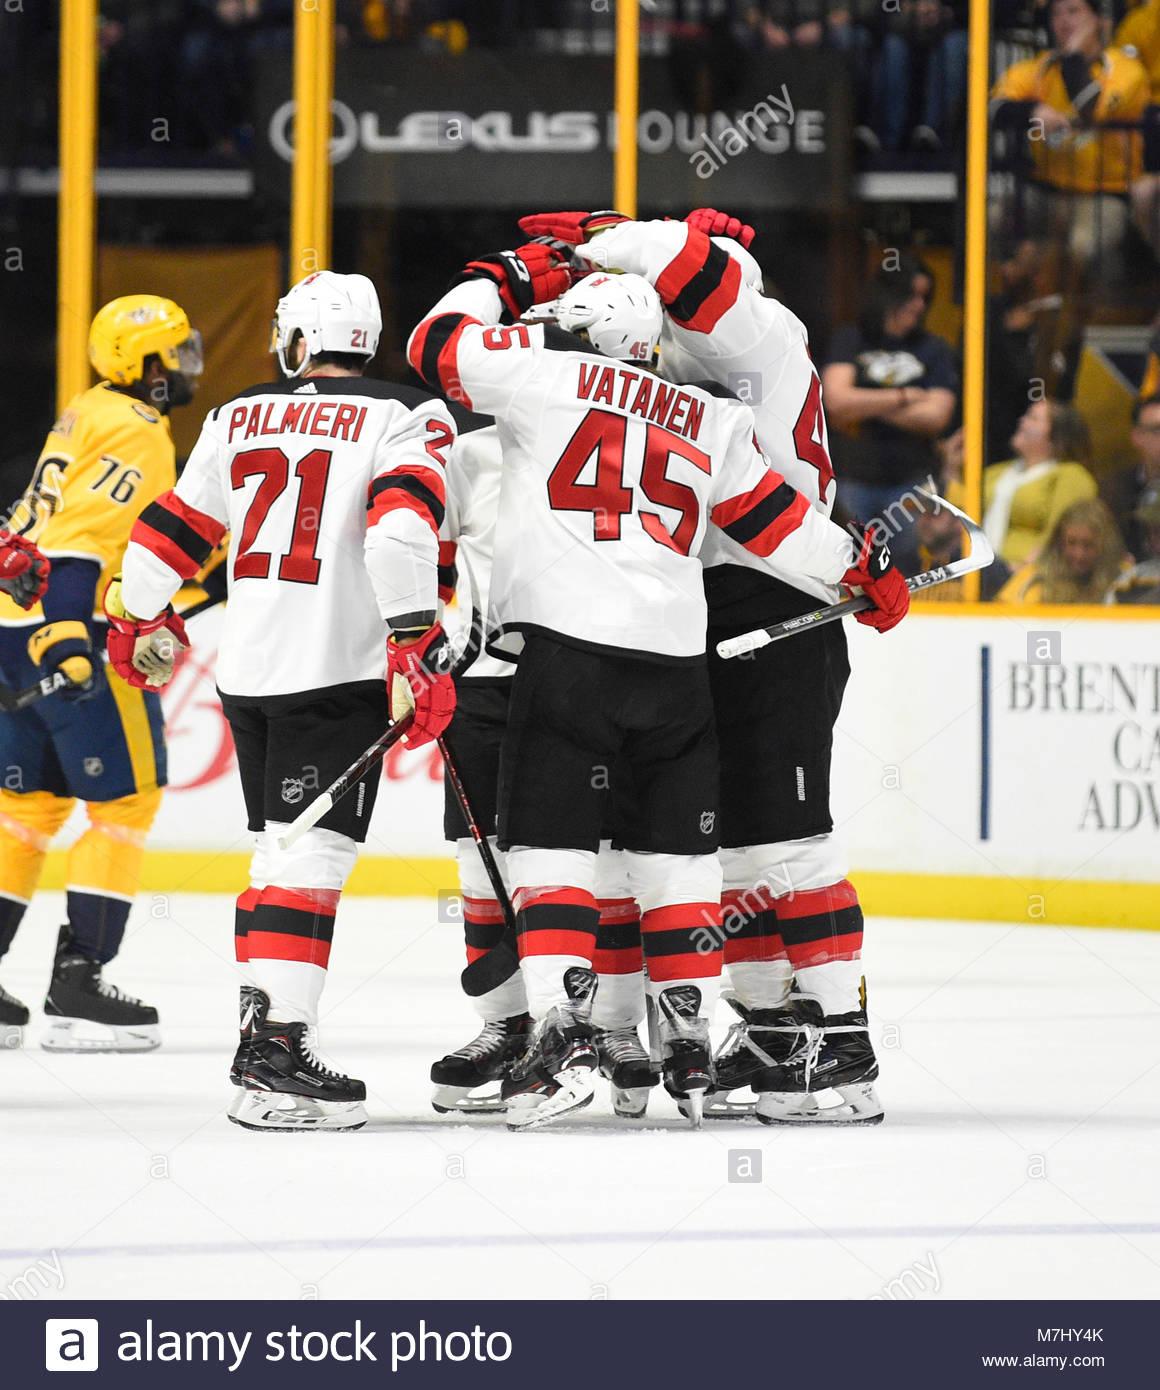 Bridgestone Arena. 10th Mar, 2018. USA New Jersey Devils defenseman Sami Vatanen (45) celebrates with his teammates - Stock Image